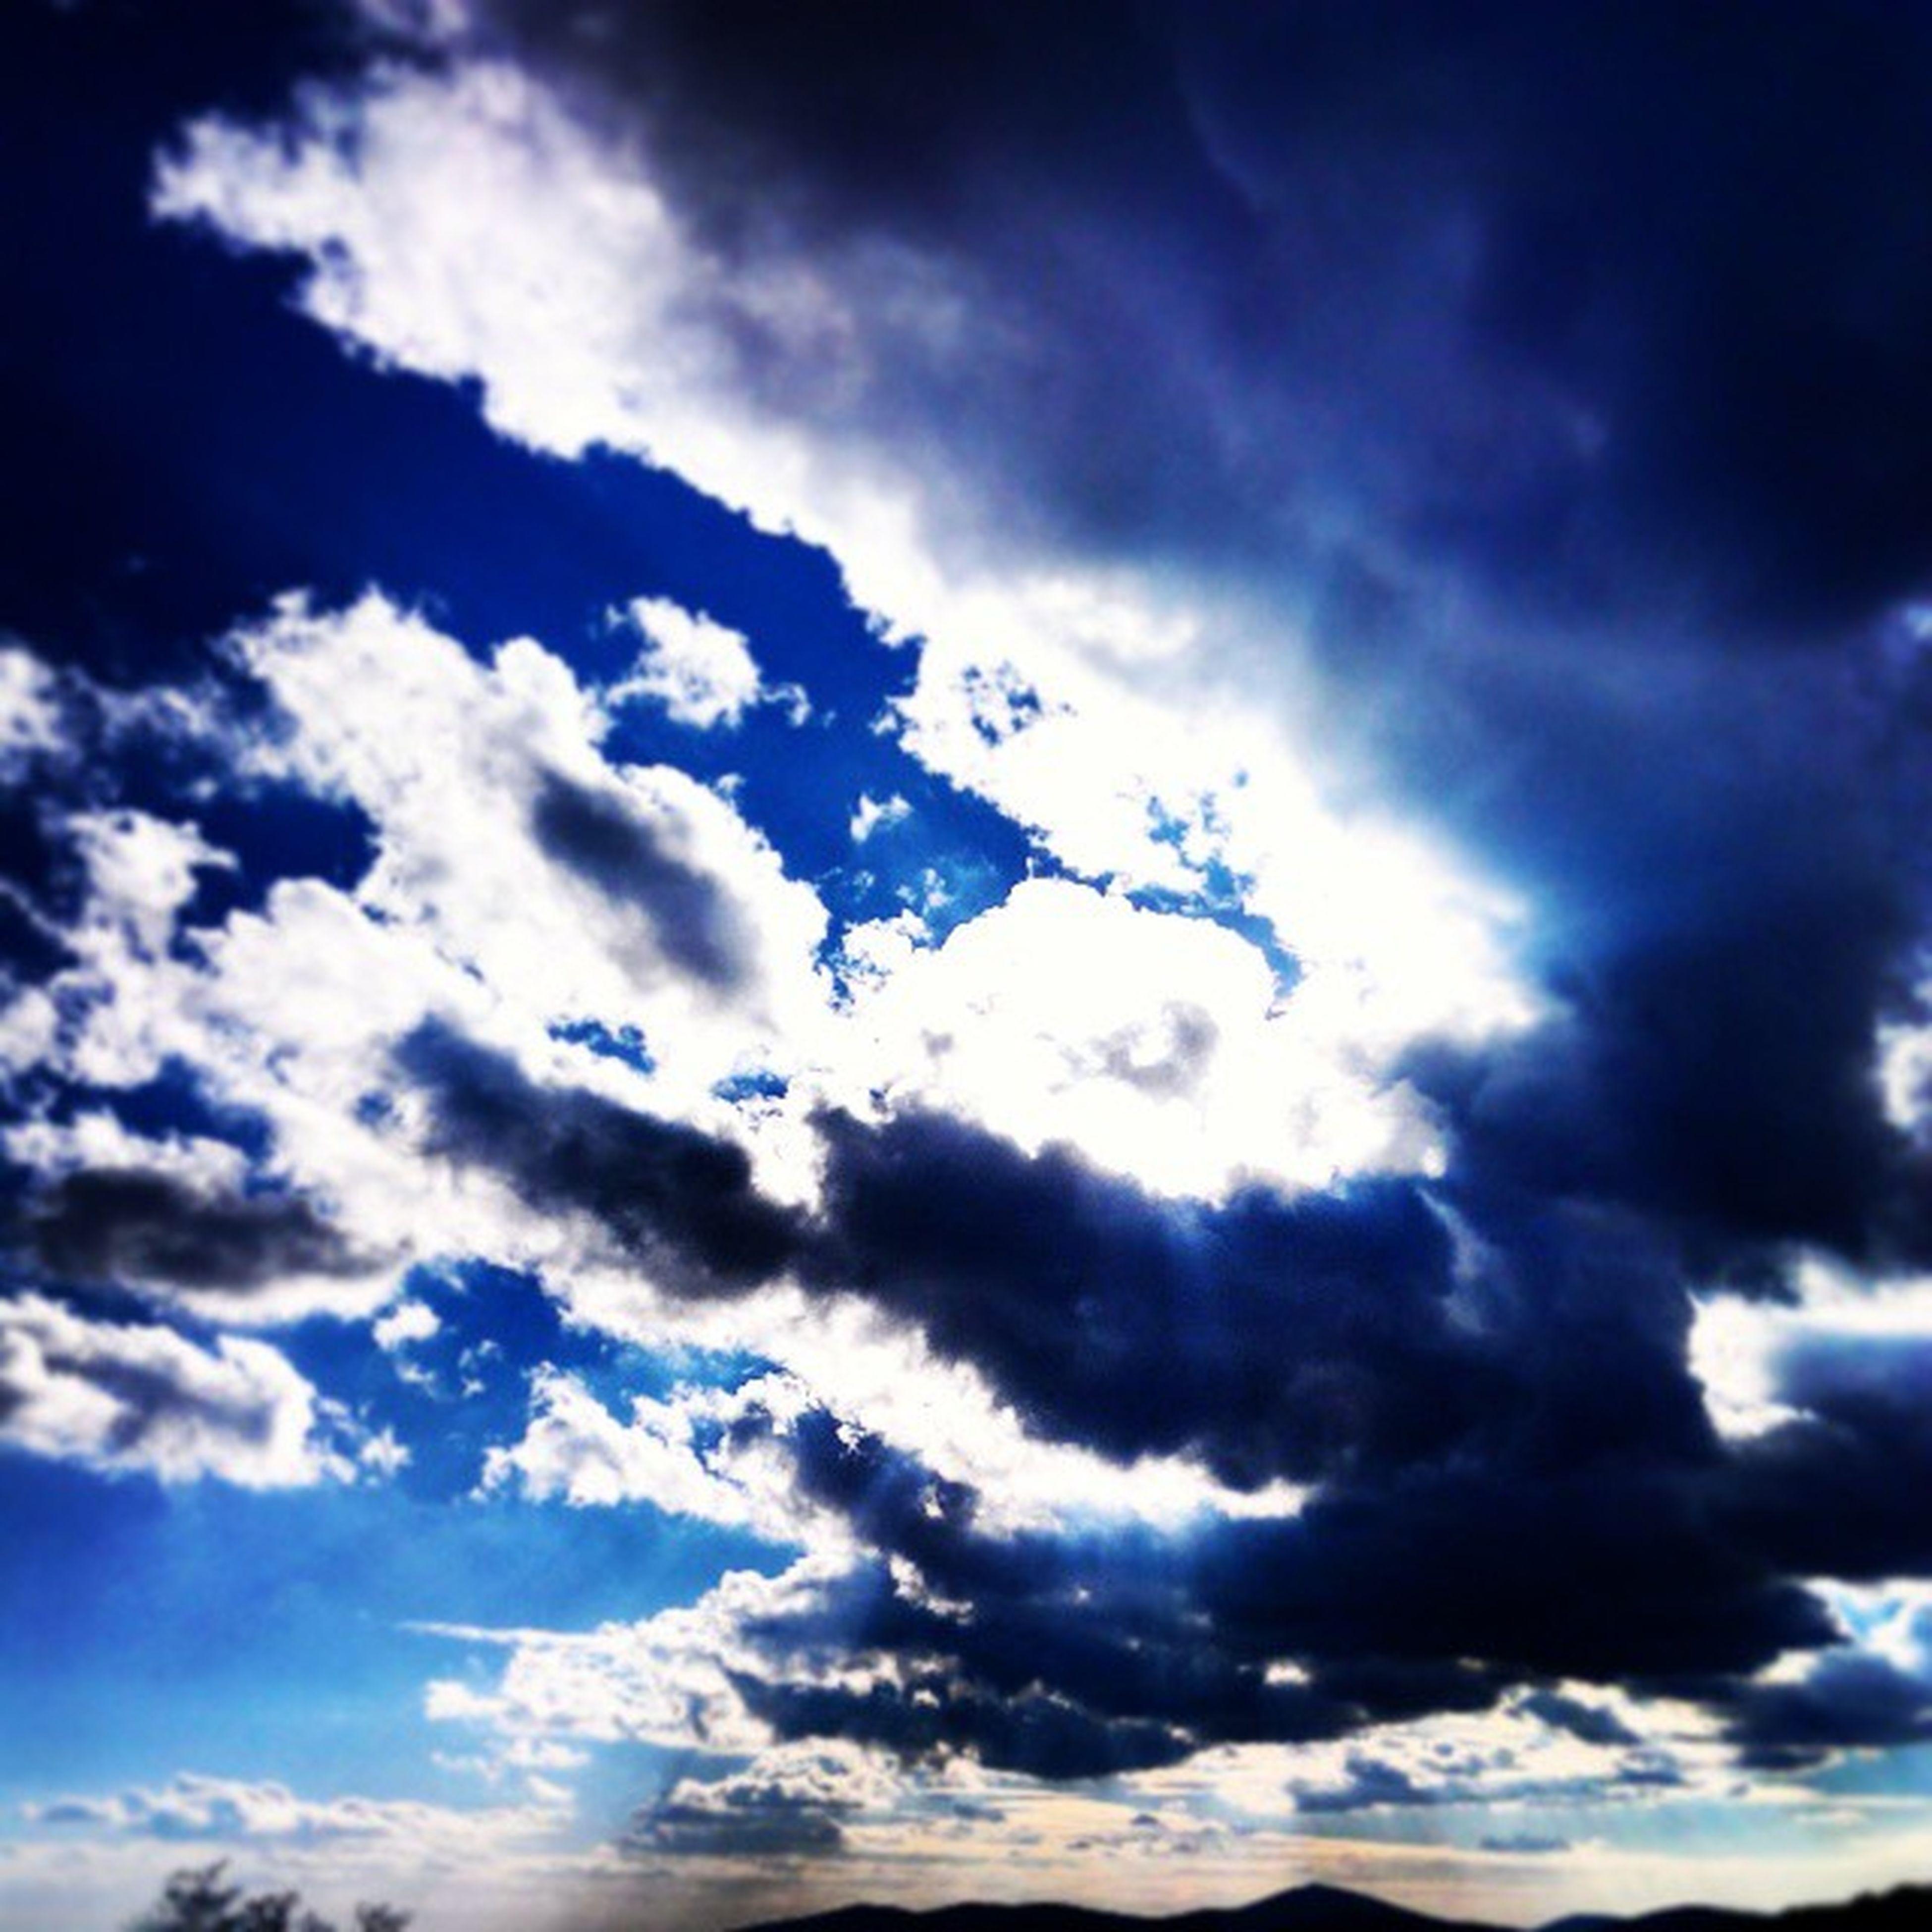 Clouds Air Alenproject ALEN dark canakkale cold wind thewayneverends blue sun